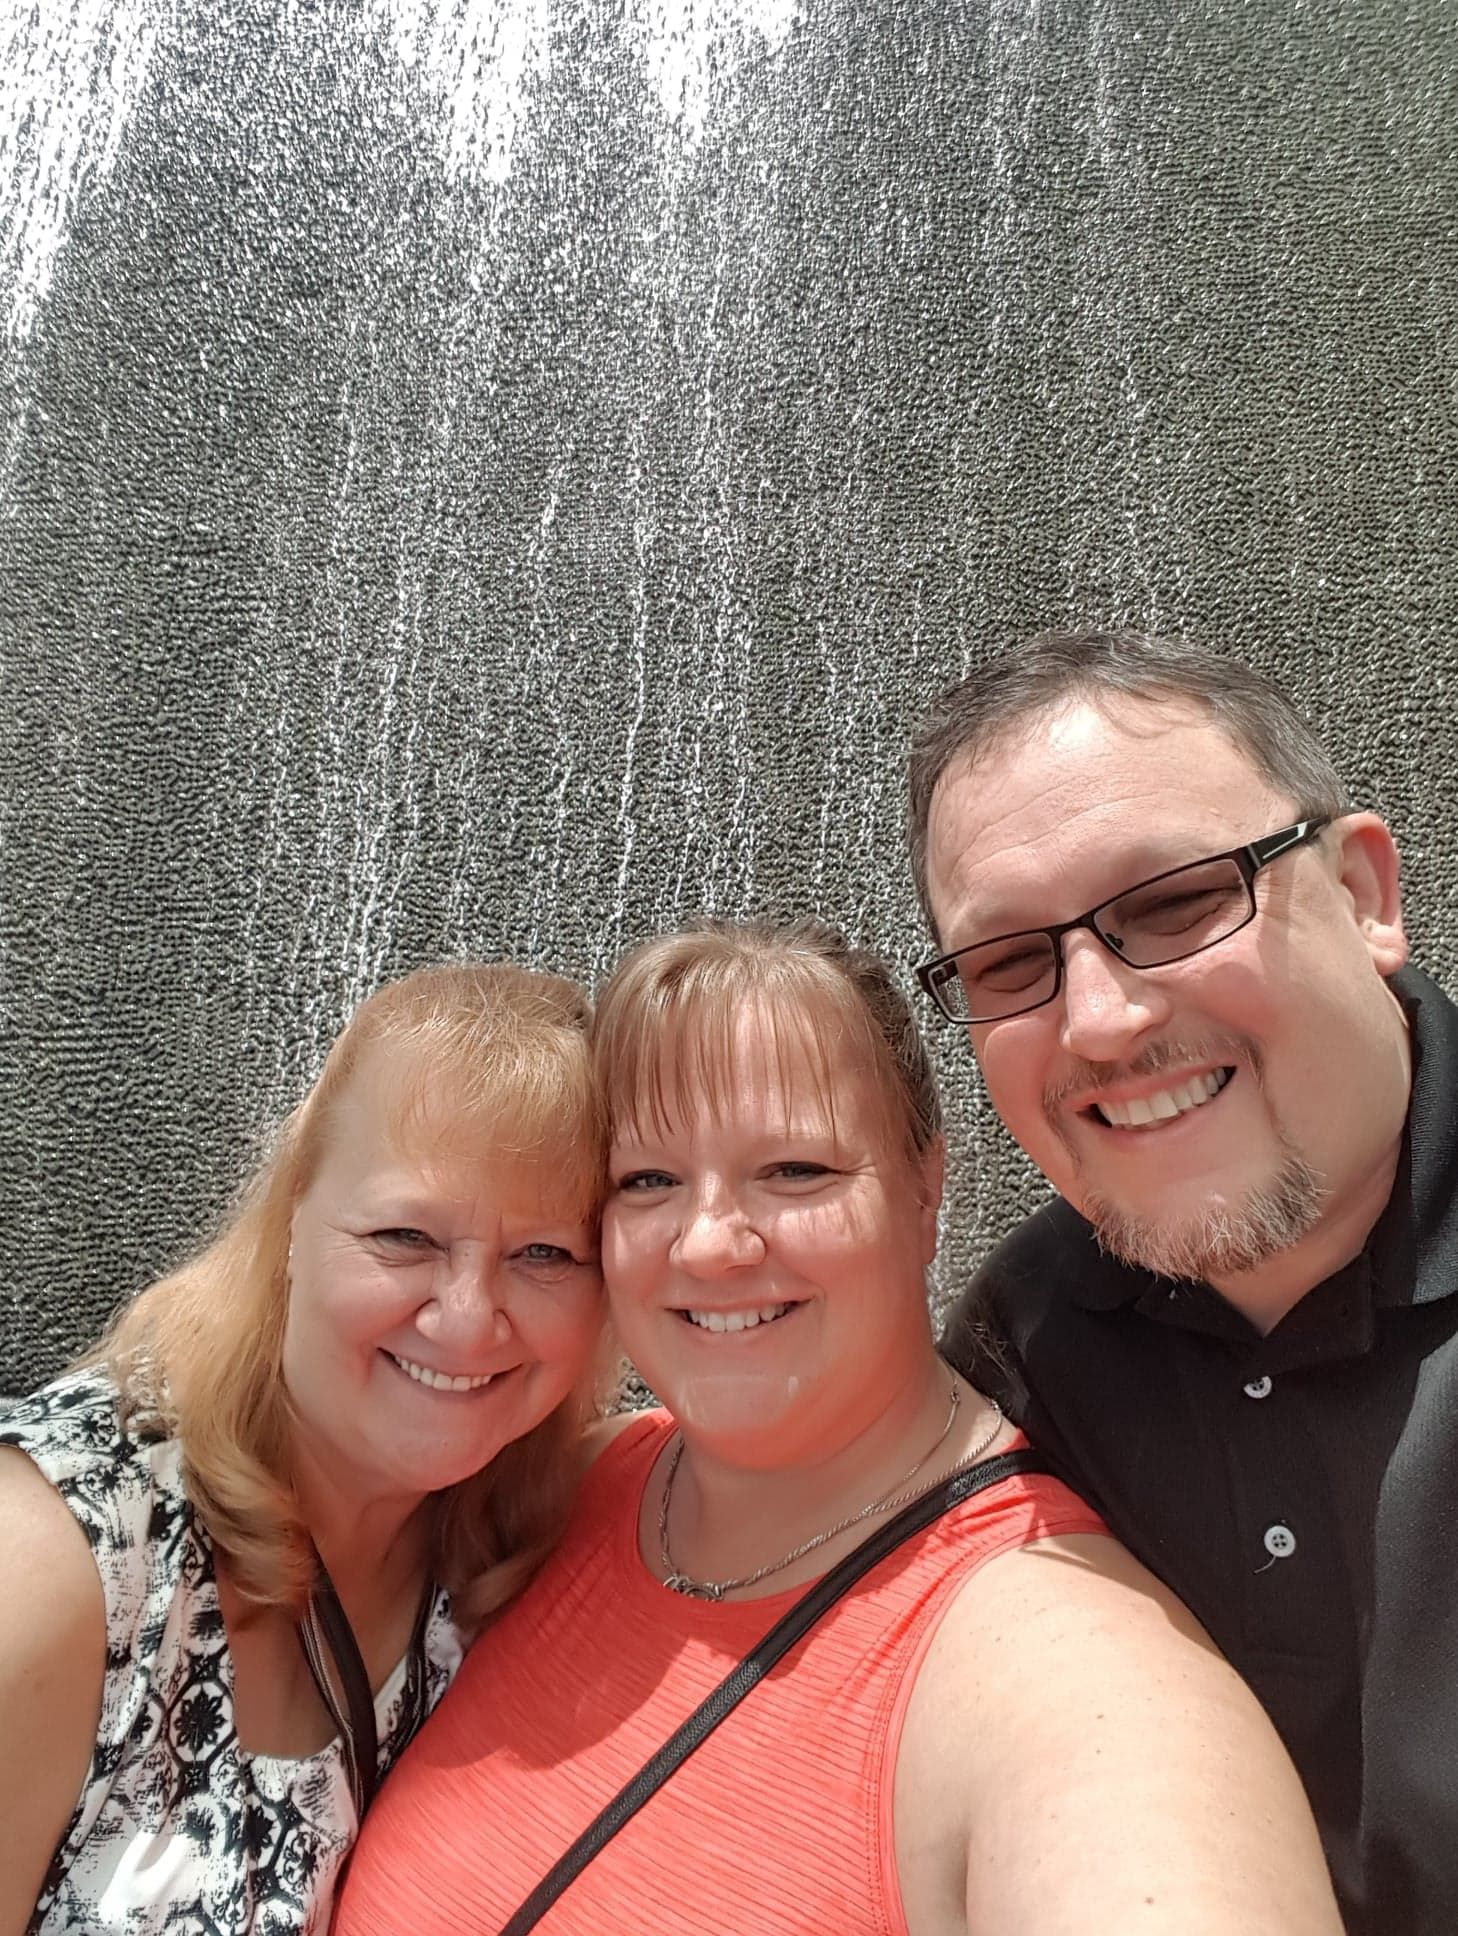 Vegas Vacation Daughter